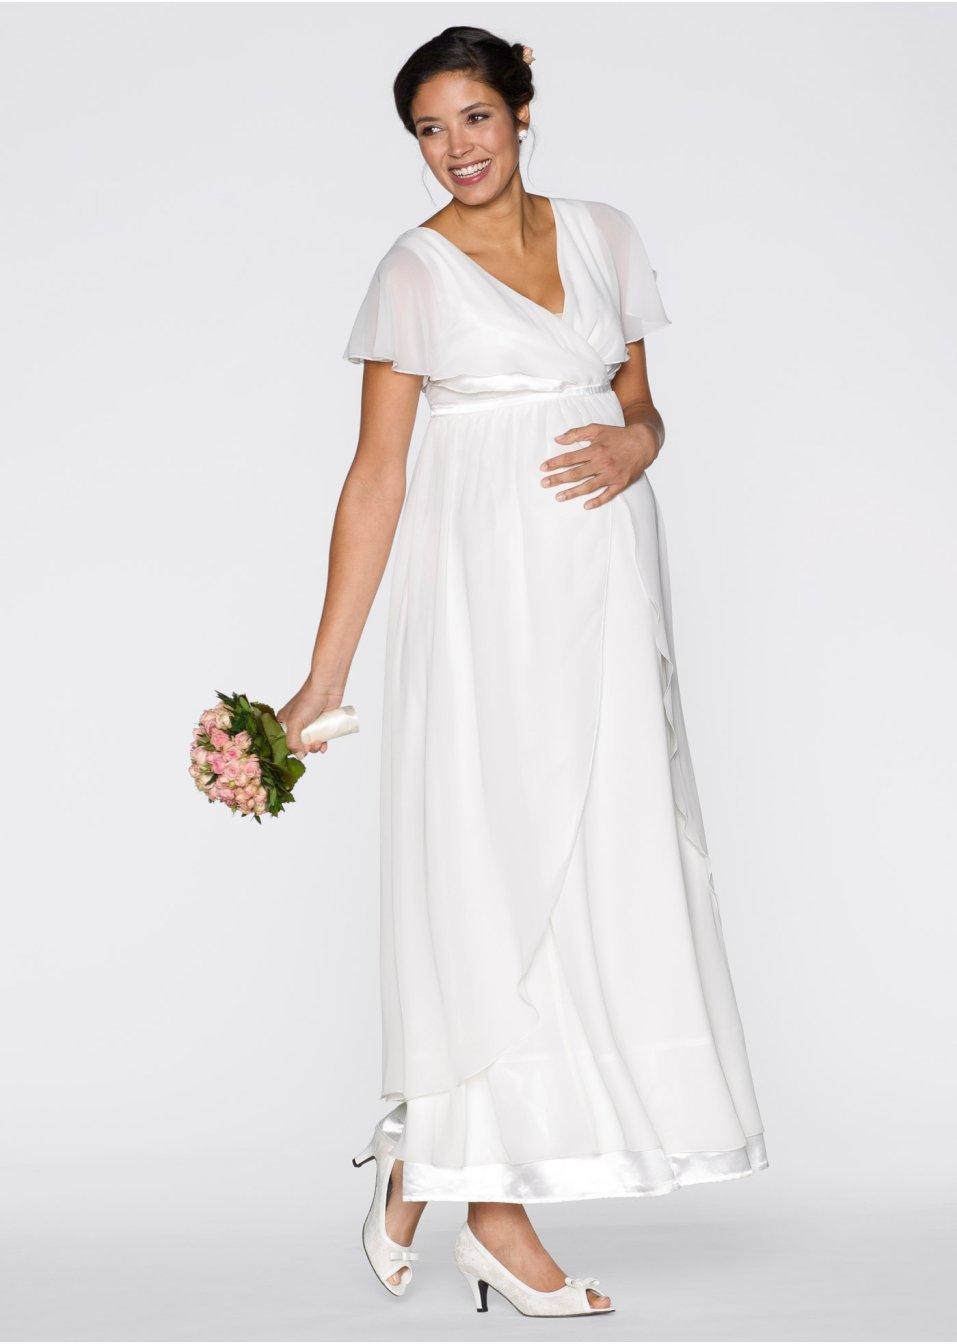 Tehu šaty - Obrázok č. 49